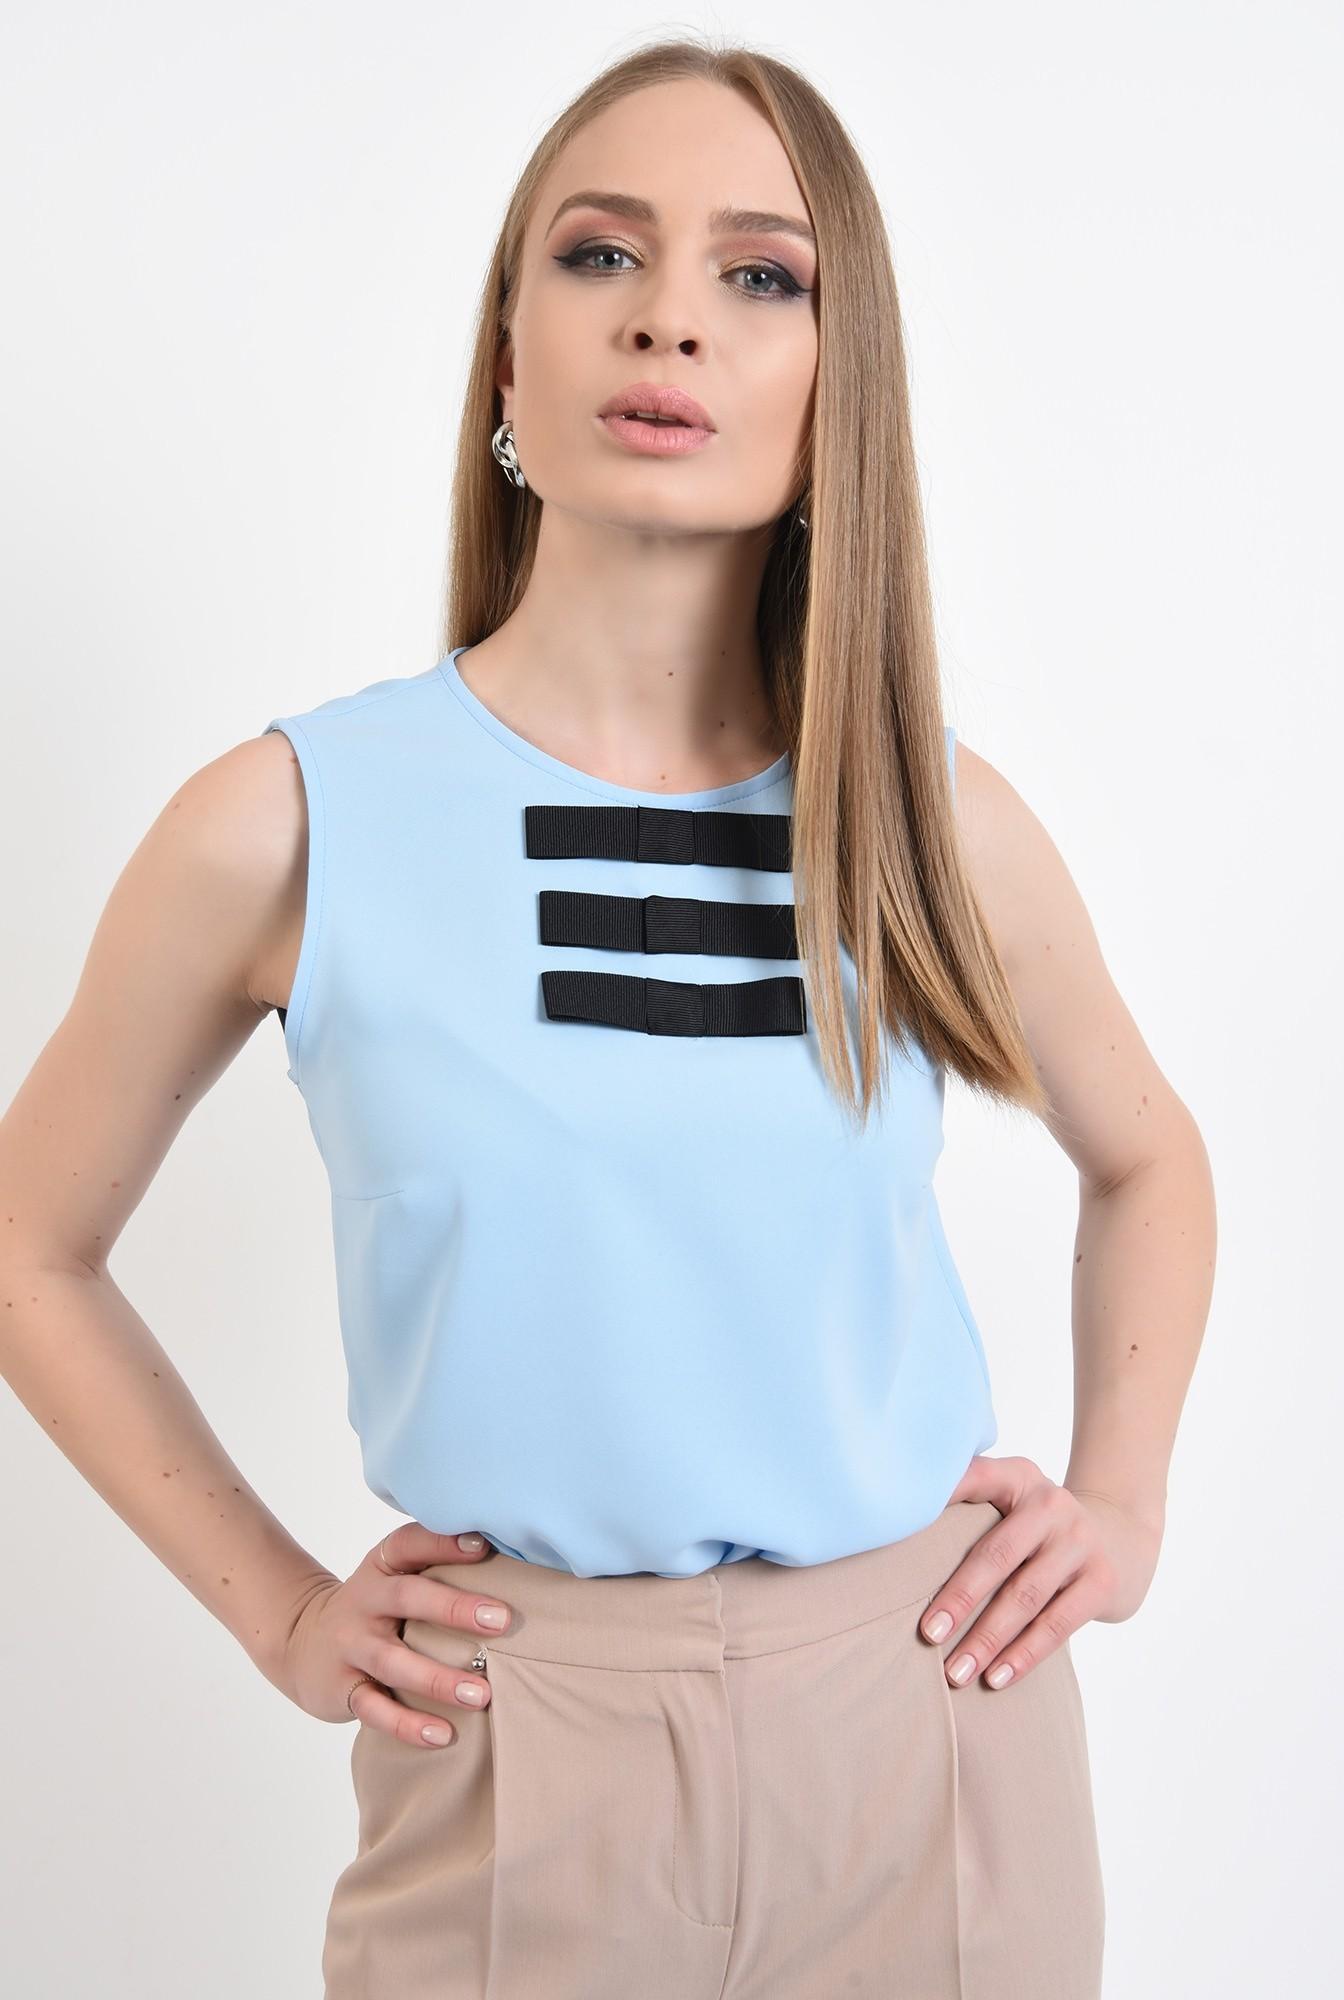 2 - bluza bleu, fara maneci, cu funde negre, bluza office